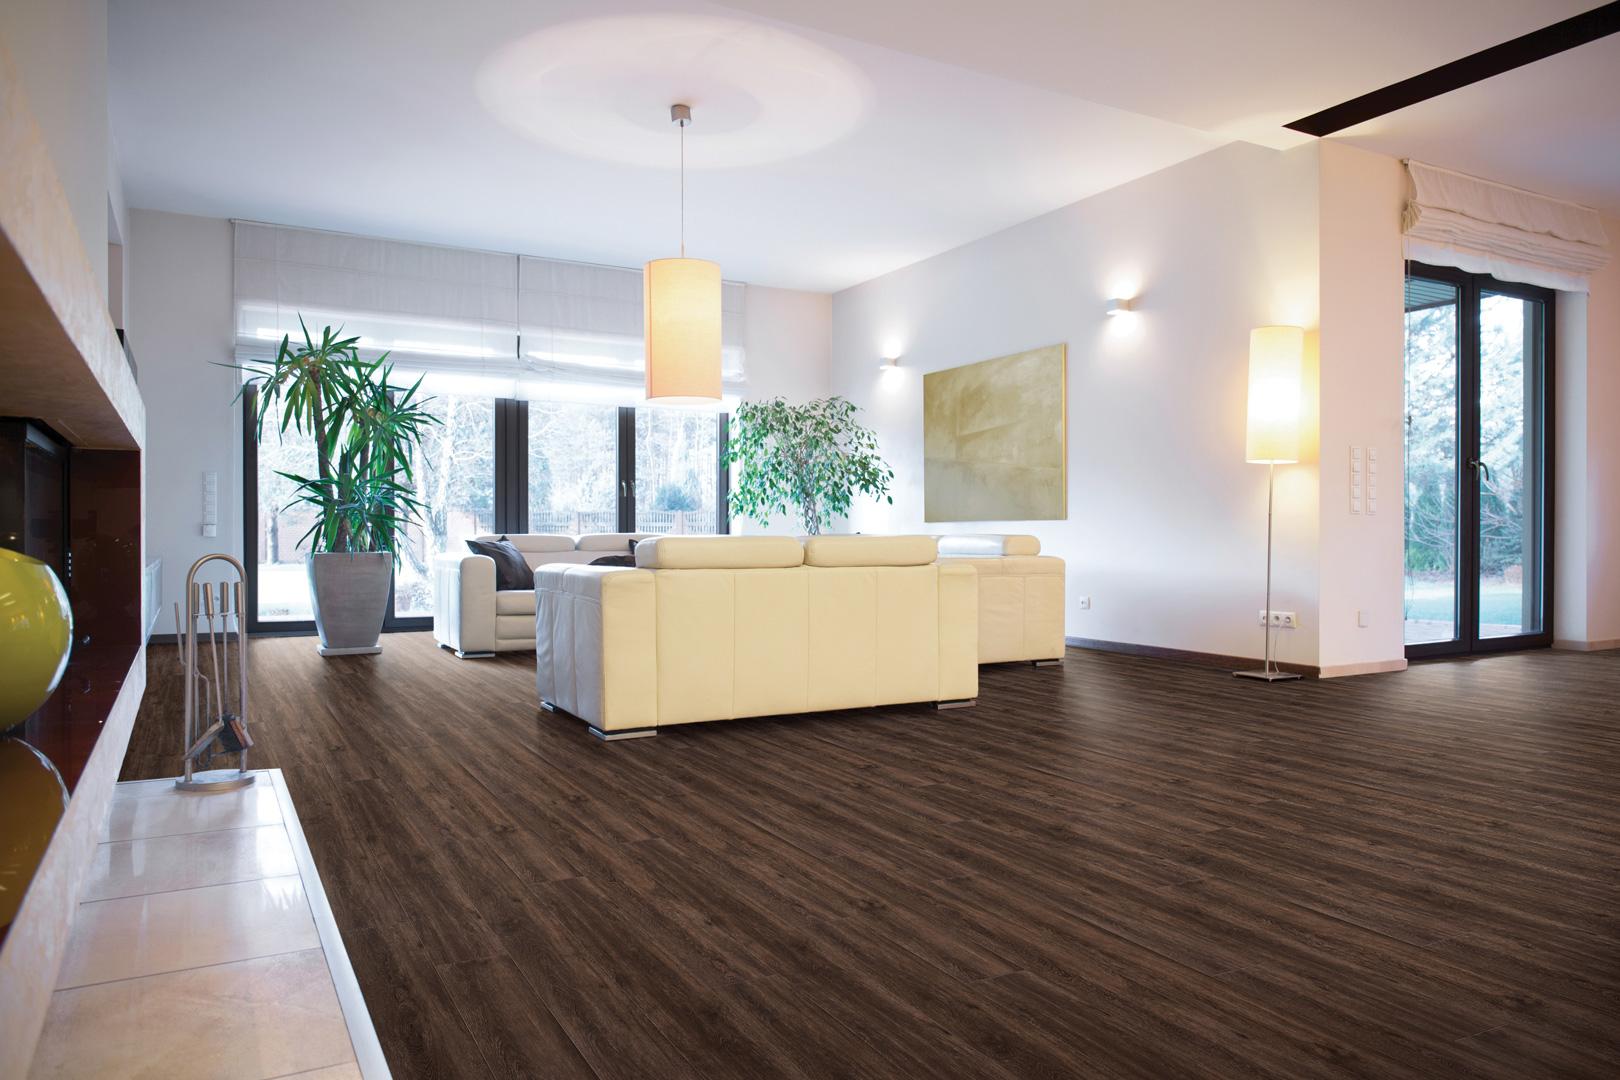 Vinyl Plank Flooring Coretec Plus Hd Xl Enhanced Design